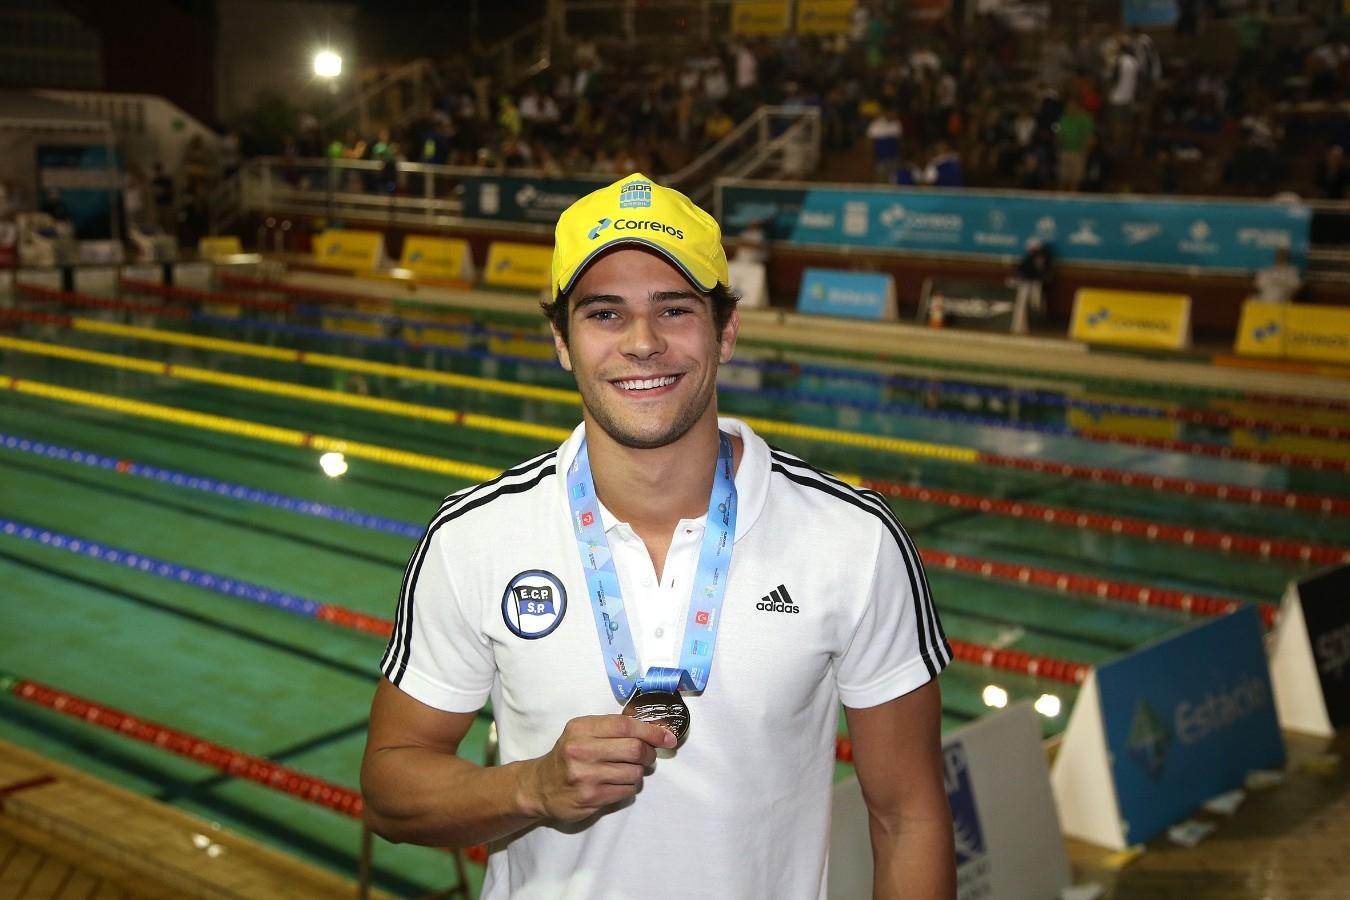 Marcelo - Trofeu Jose Finkel de Natacao no Clube Internacional de Regatas. 14 de Setembro de 2016, Santos, SP, Brasil. Foto:Satiro Sodré/SSPress.